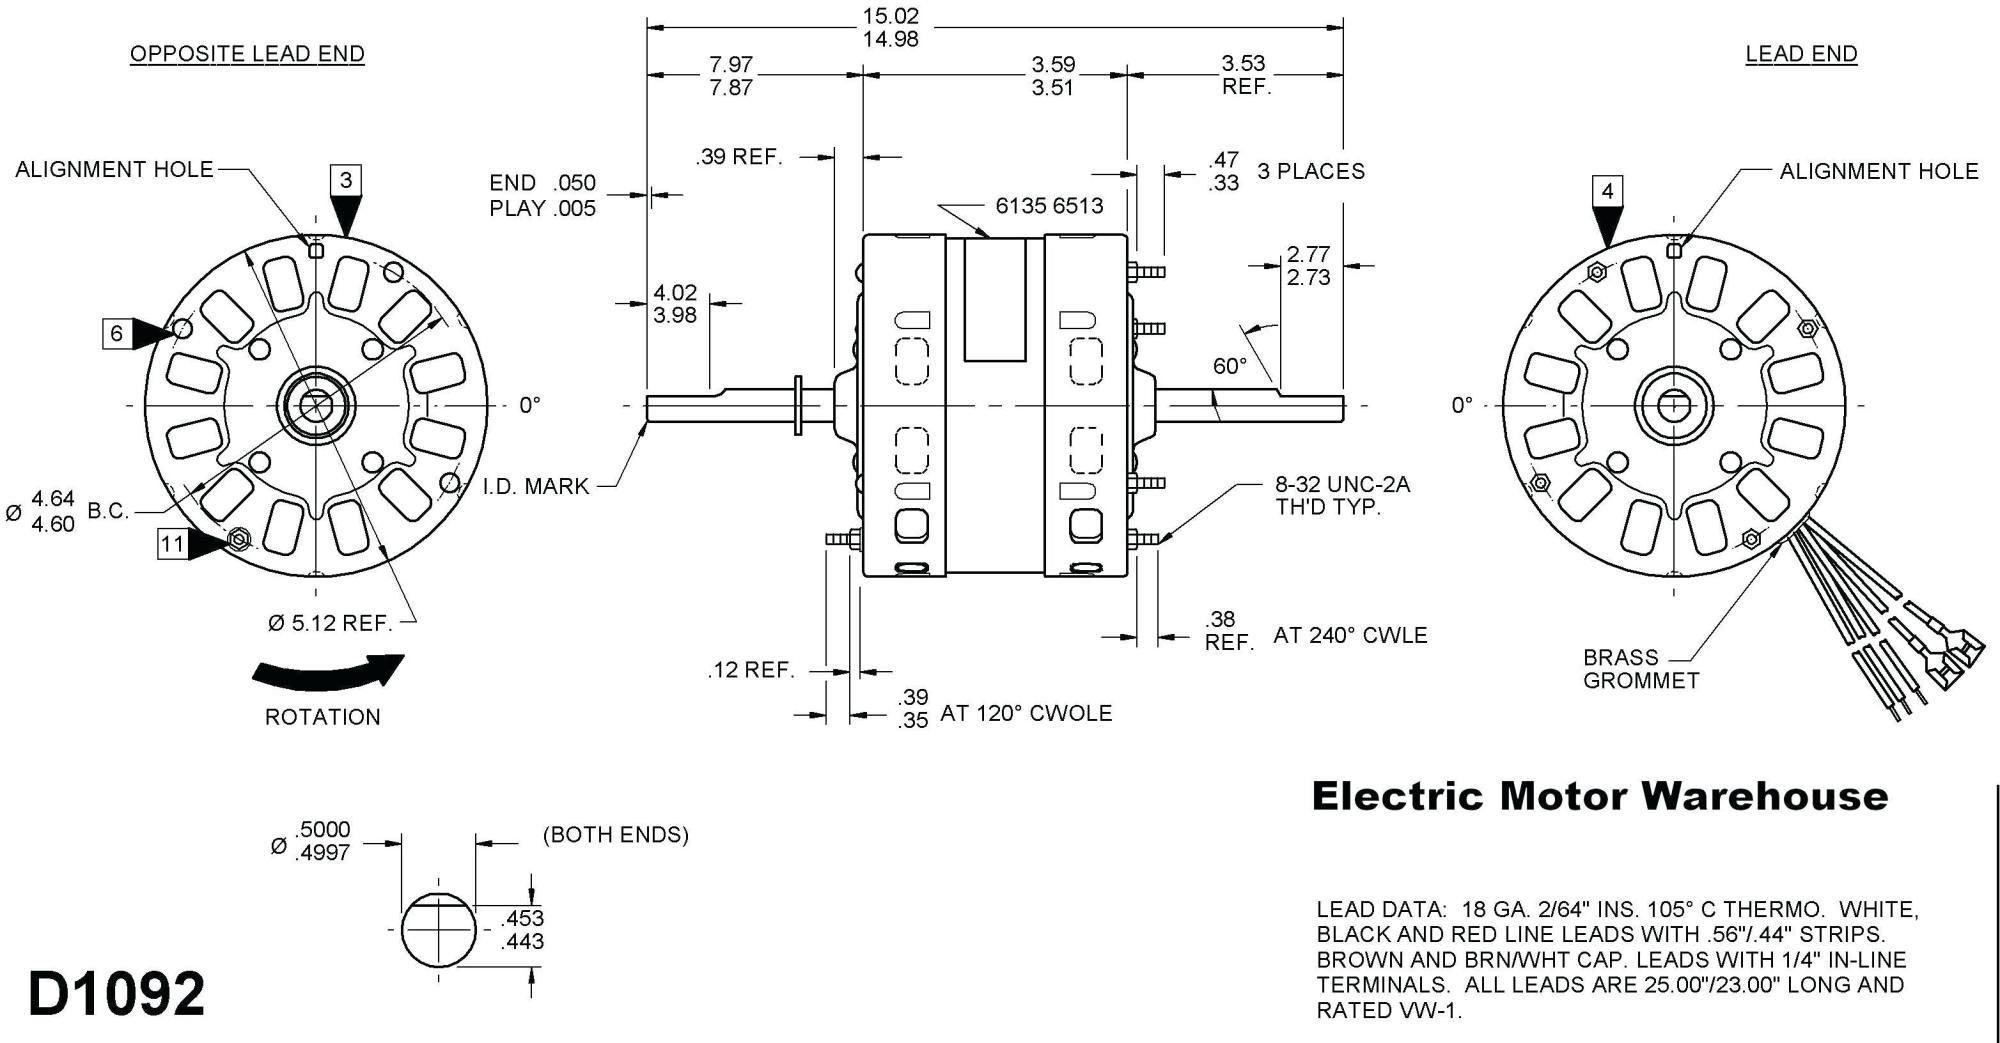 federal pa300 siren wiring diagram federal signal pa300 siren wiring diagram  federal signal pa300 siren wiring diagram